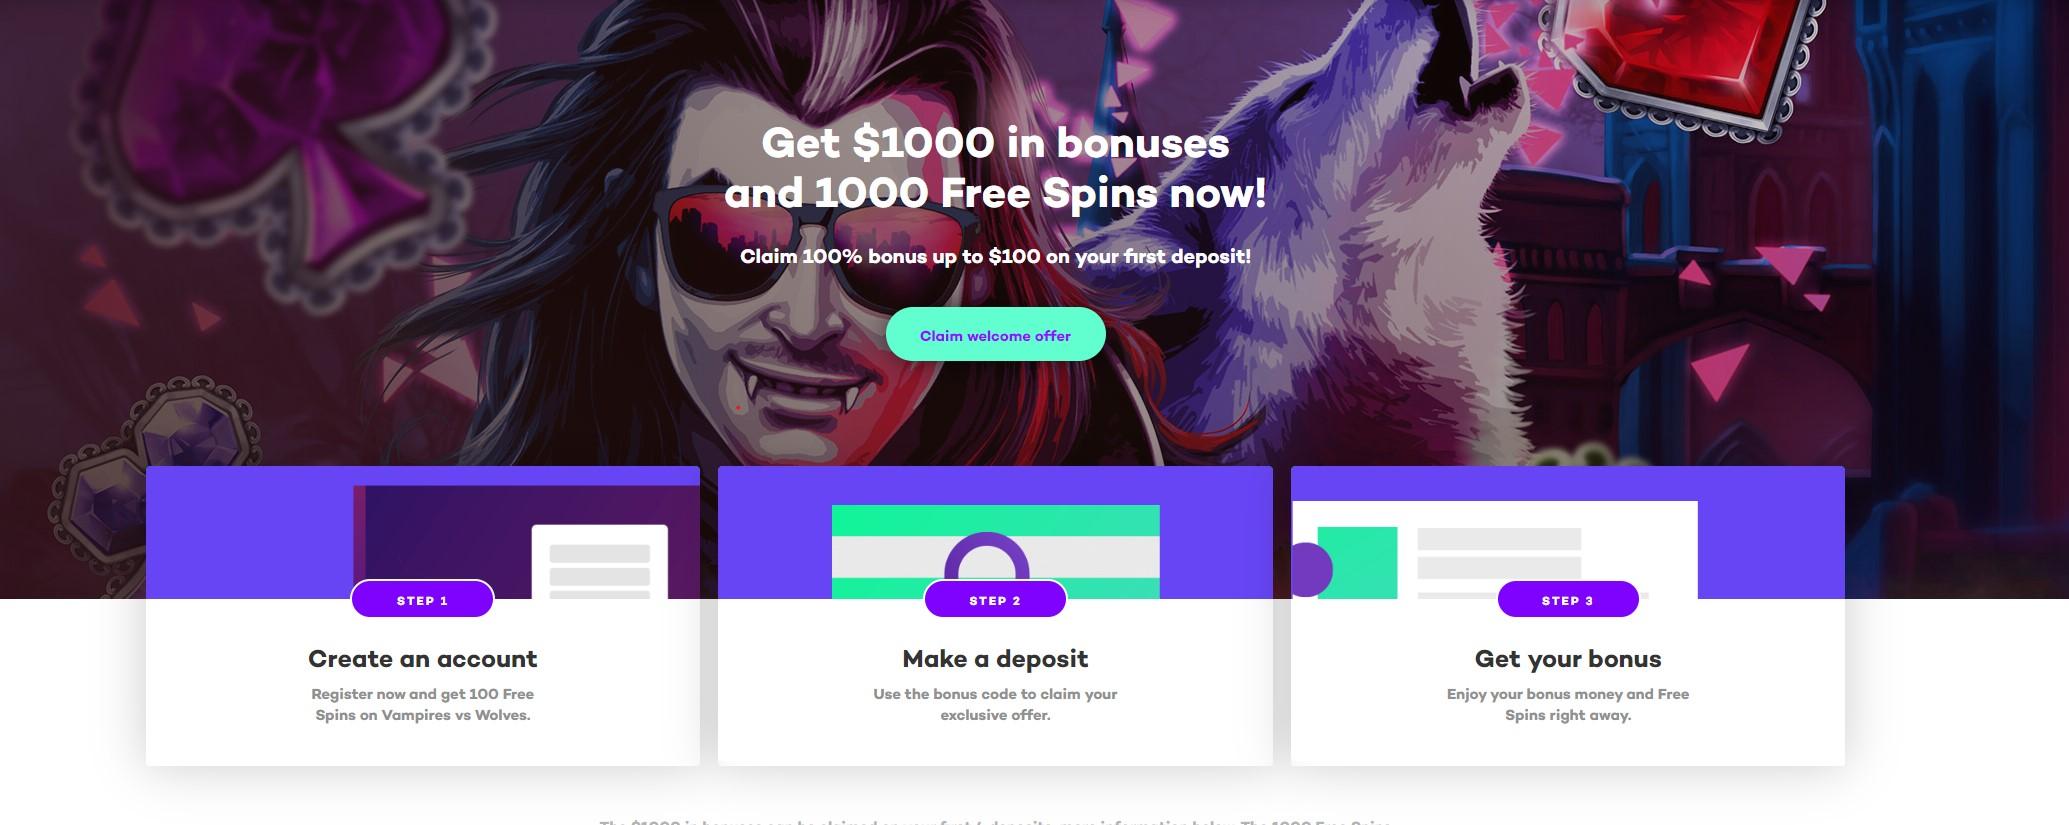 21 Com Casino Free Bonus Code From Toponlineslots Co